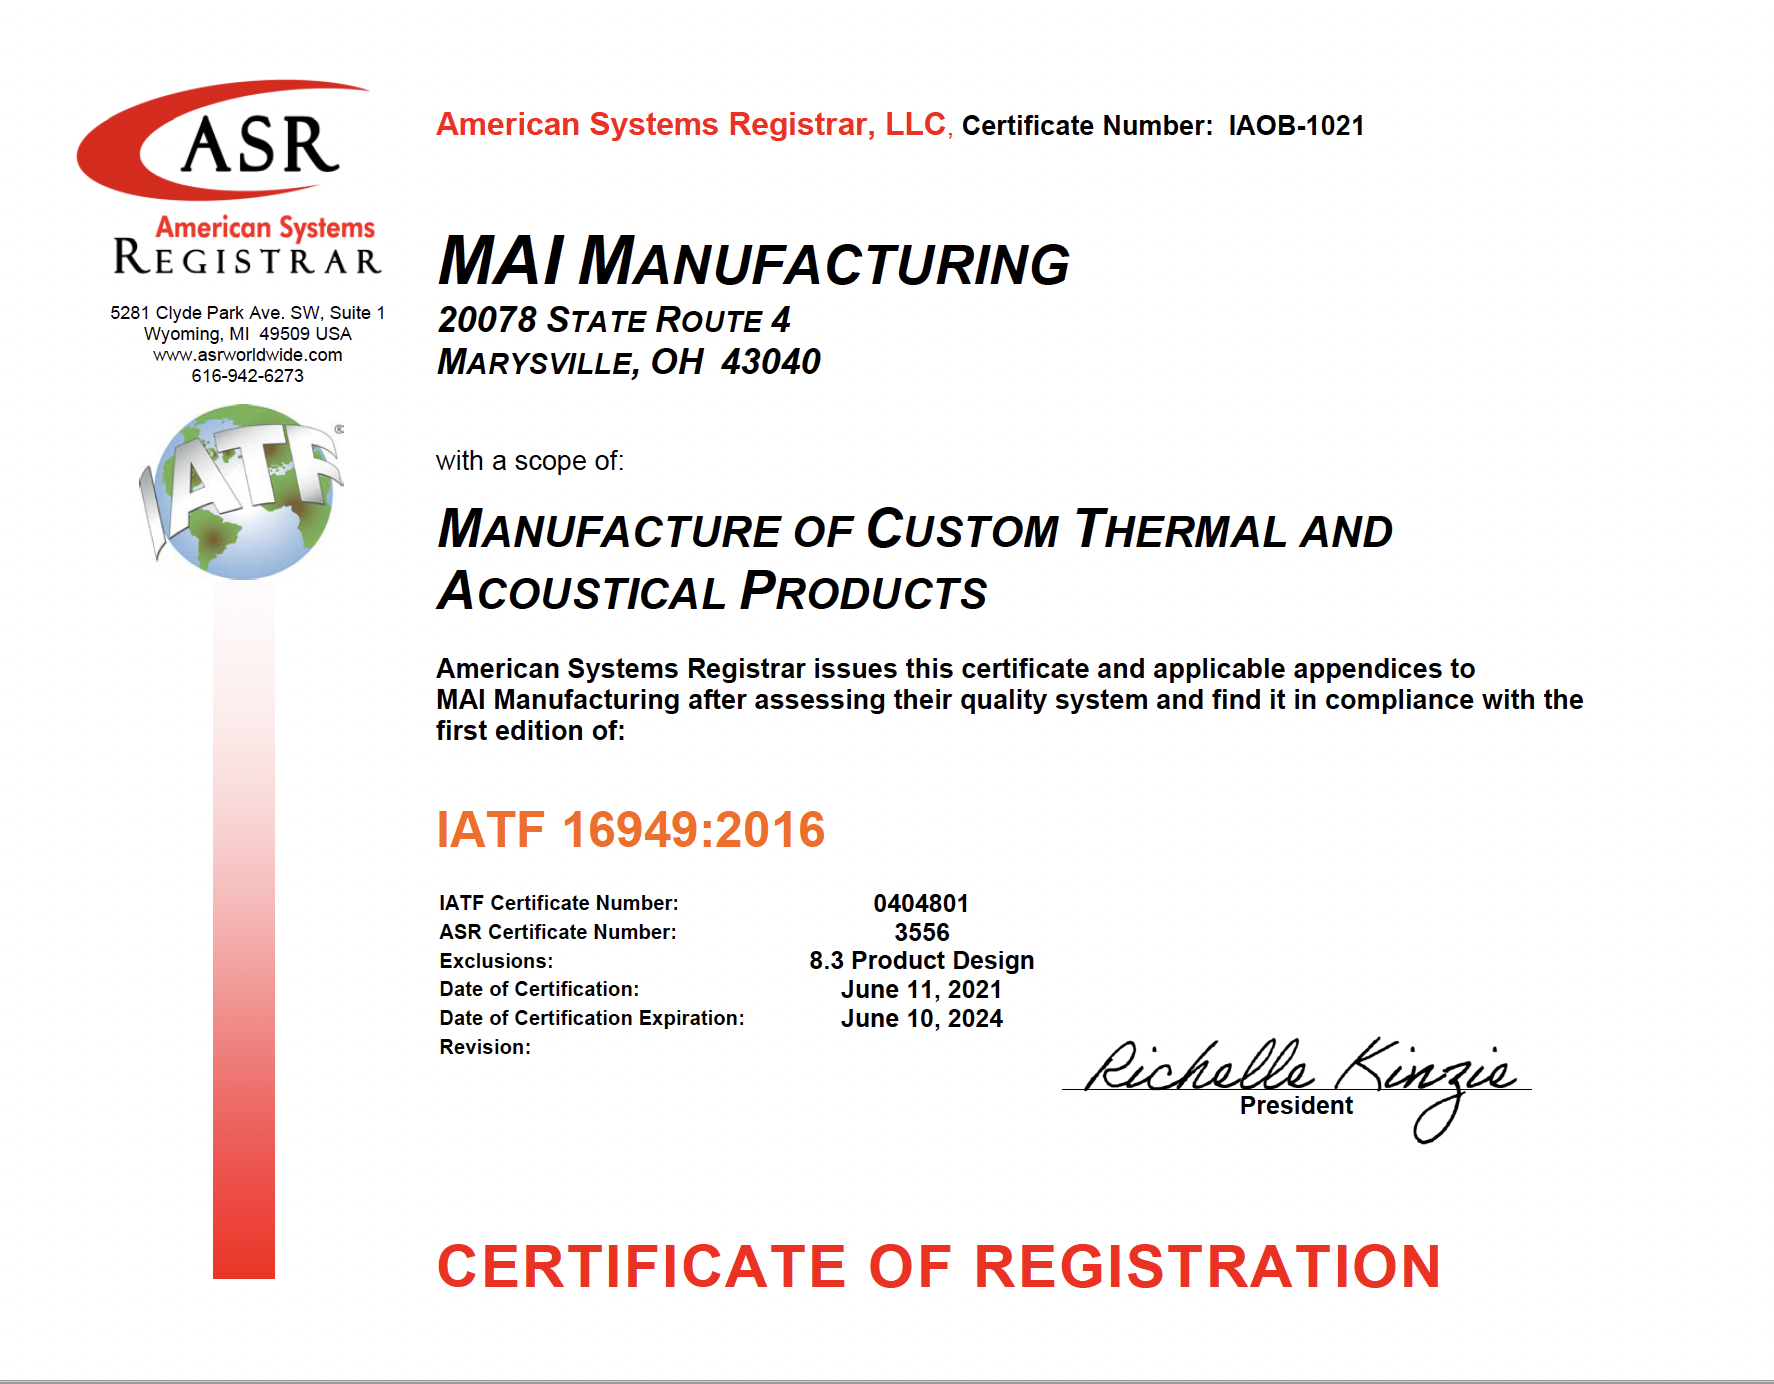 sept 2021 certificate